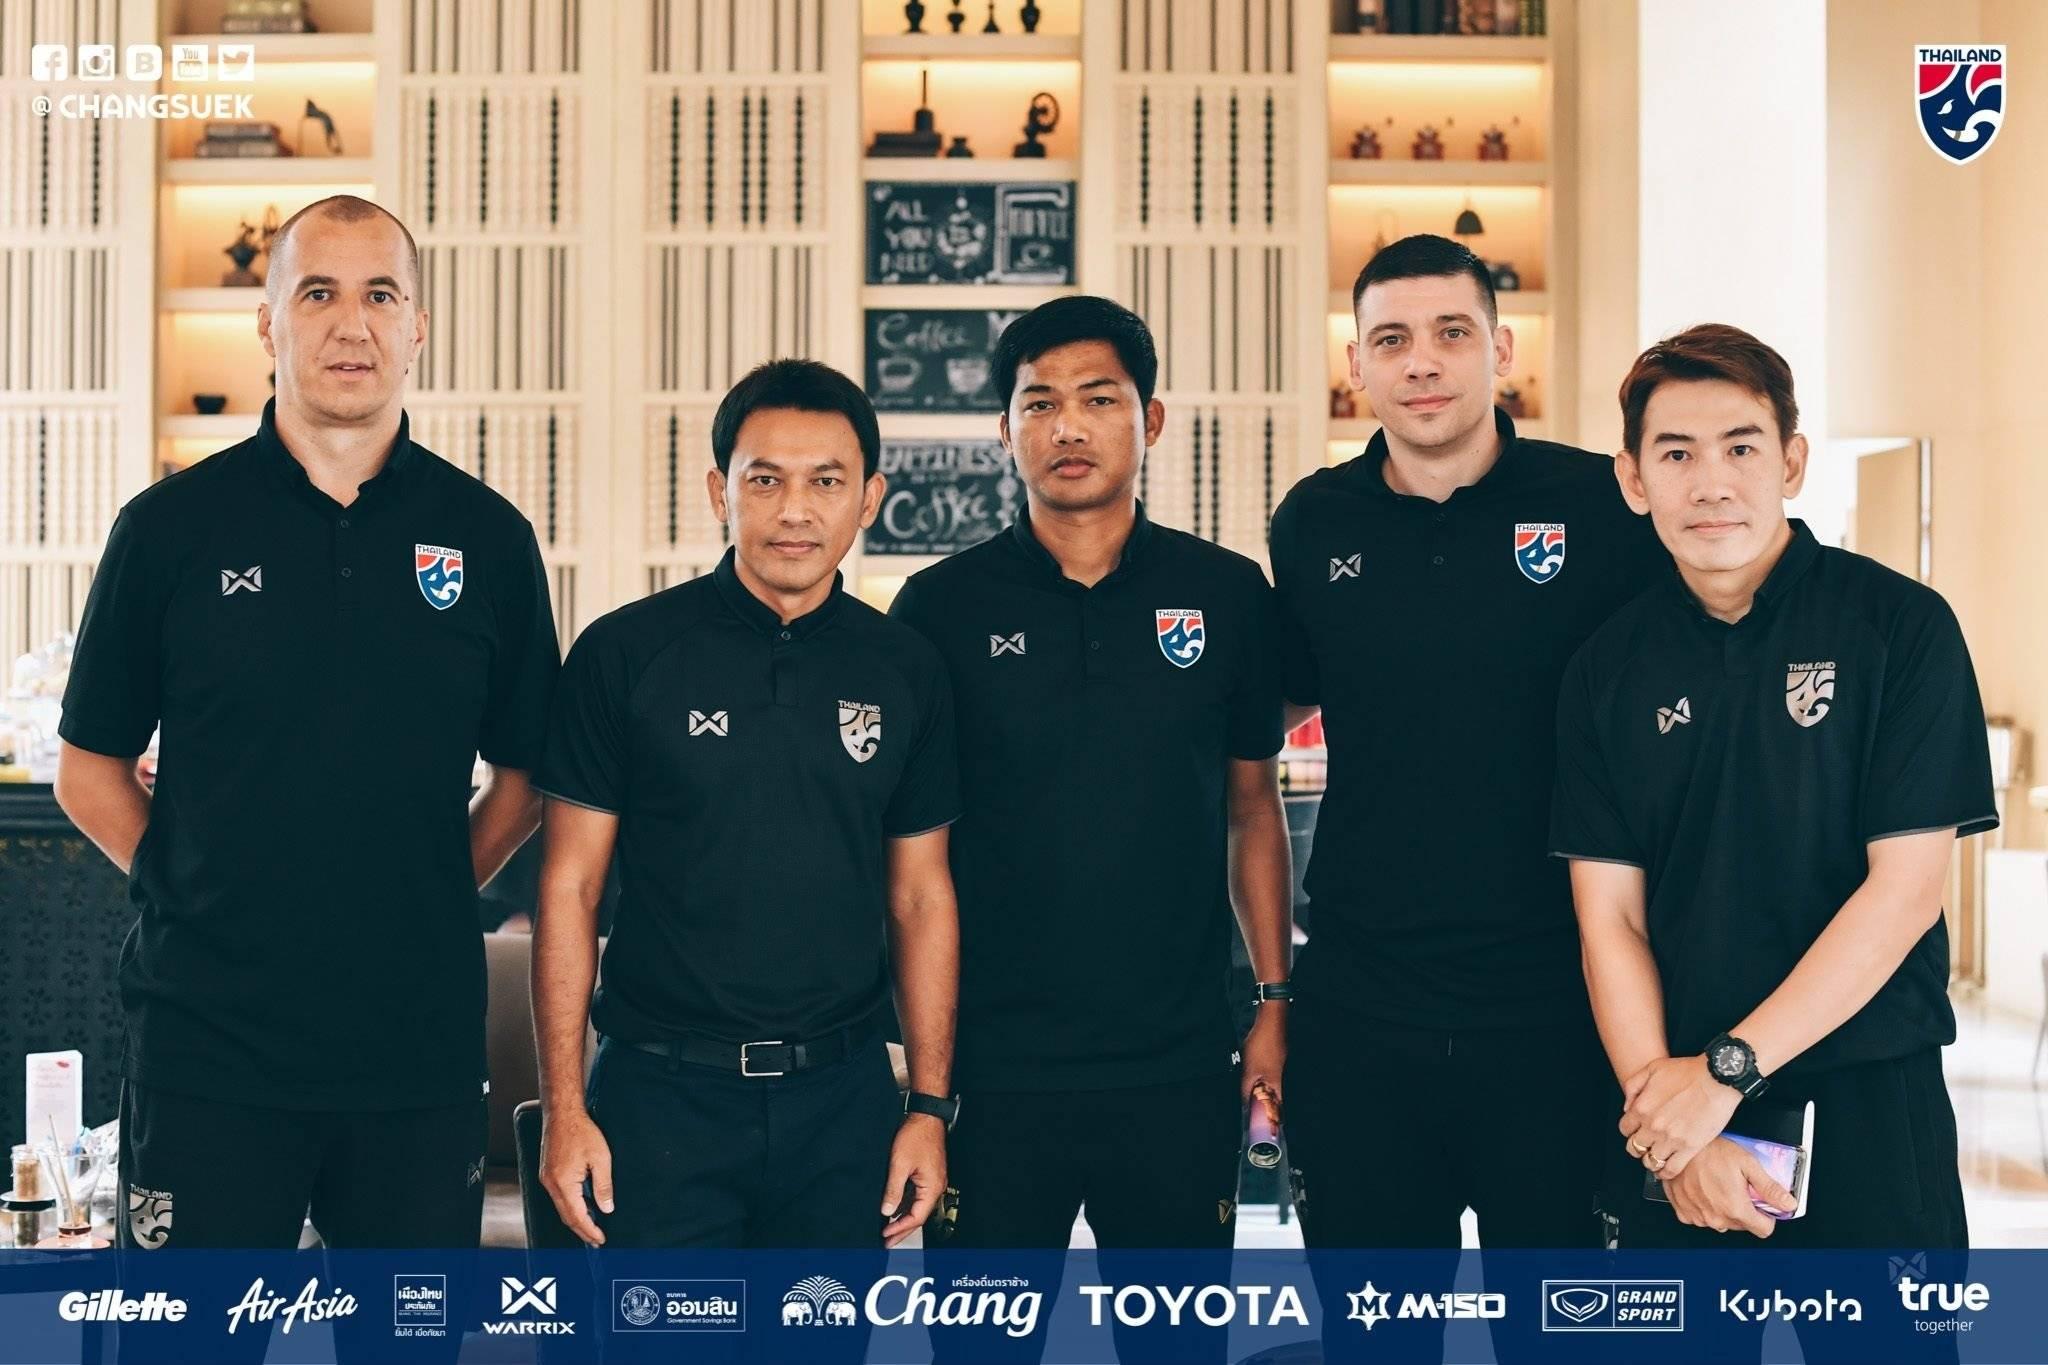 Akira Nishino's Coaching Staff Announced as Thai Squad Convene